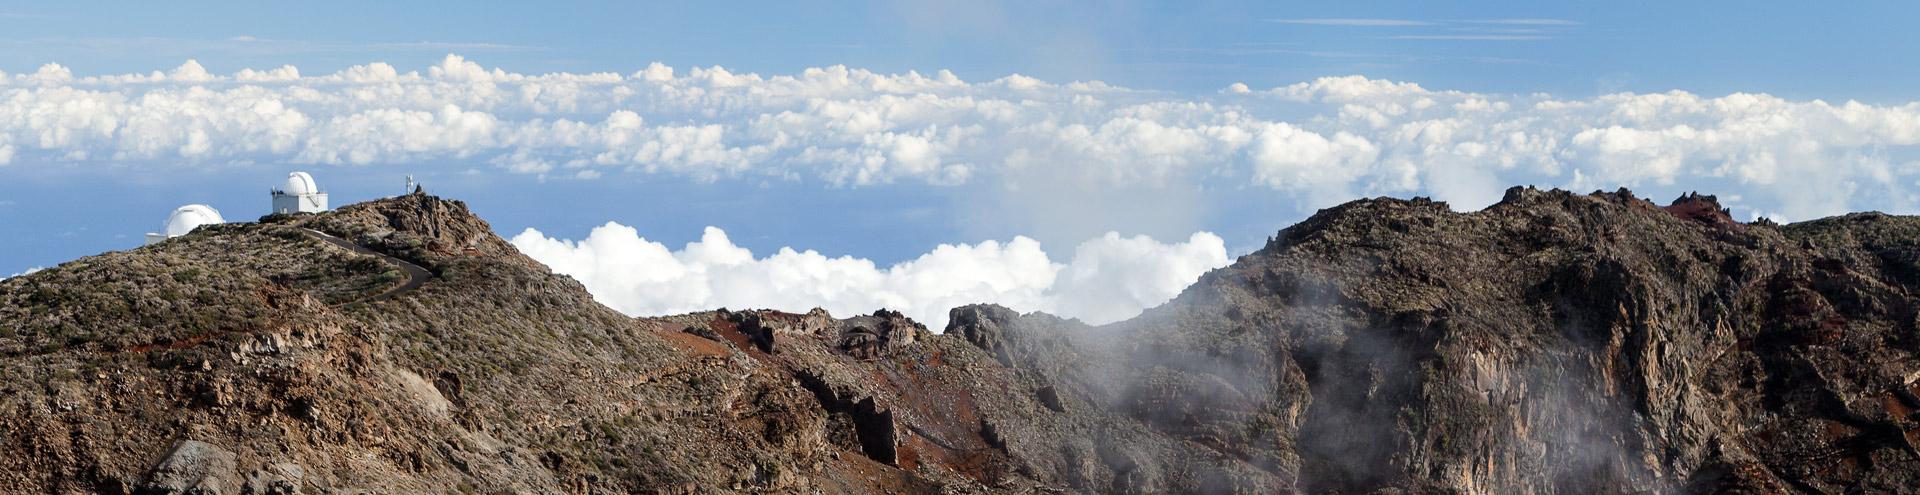 Kaldera Tamburiente auf La Palma